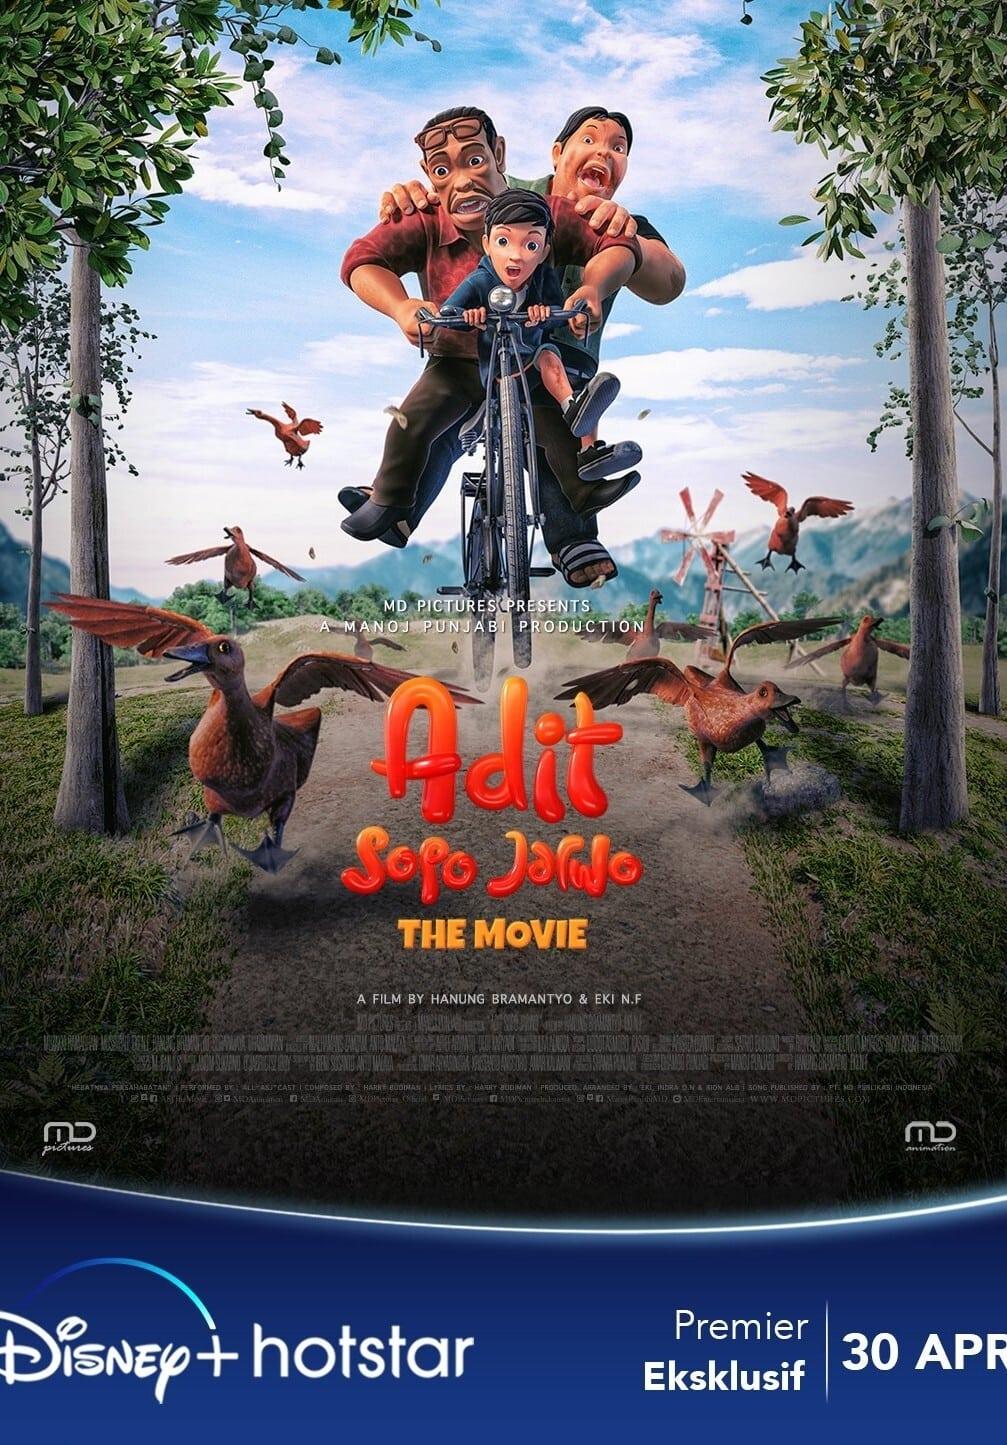 Adit Sopo Jarwo: The Movie (2021)